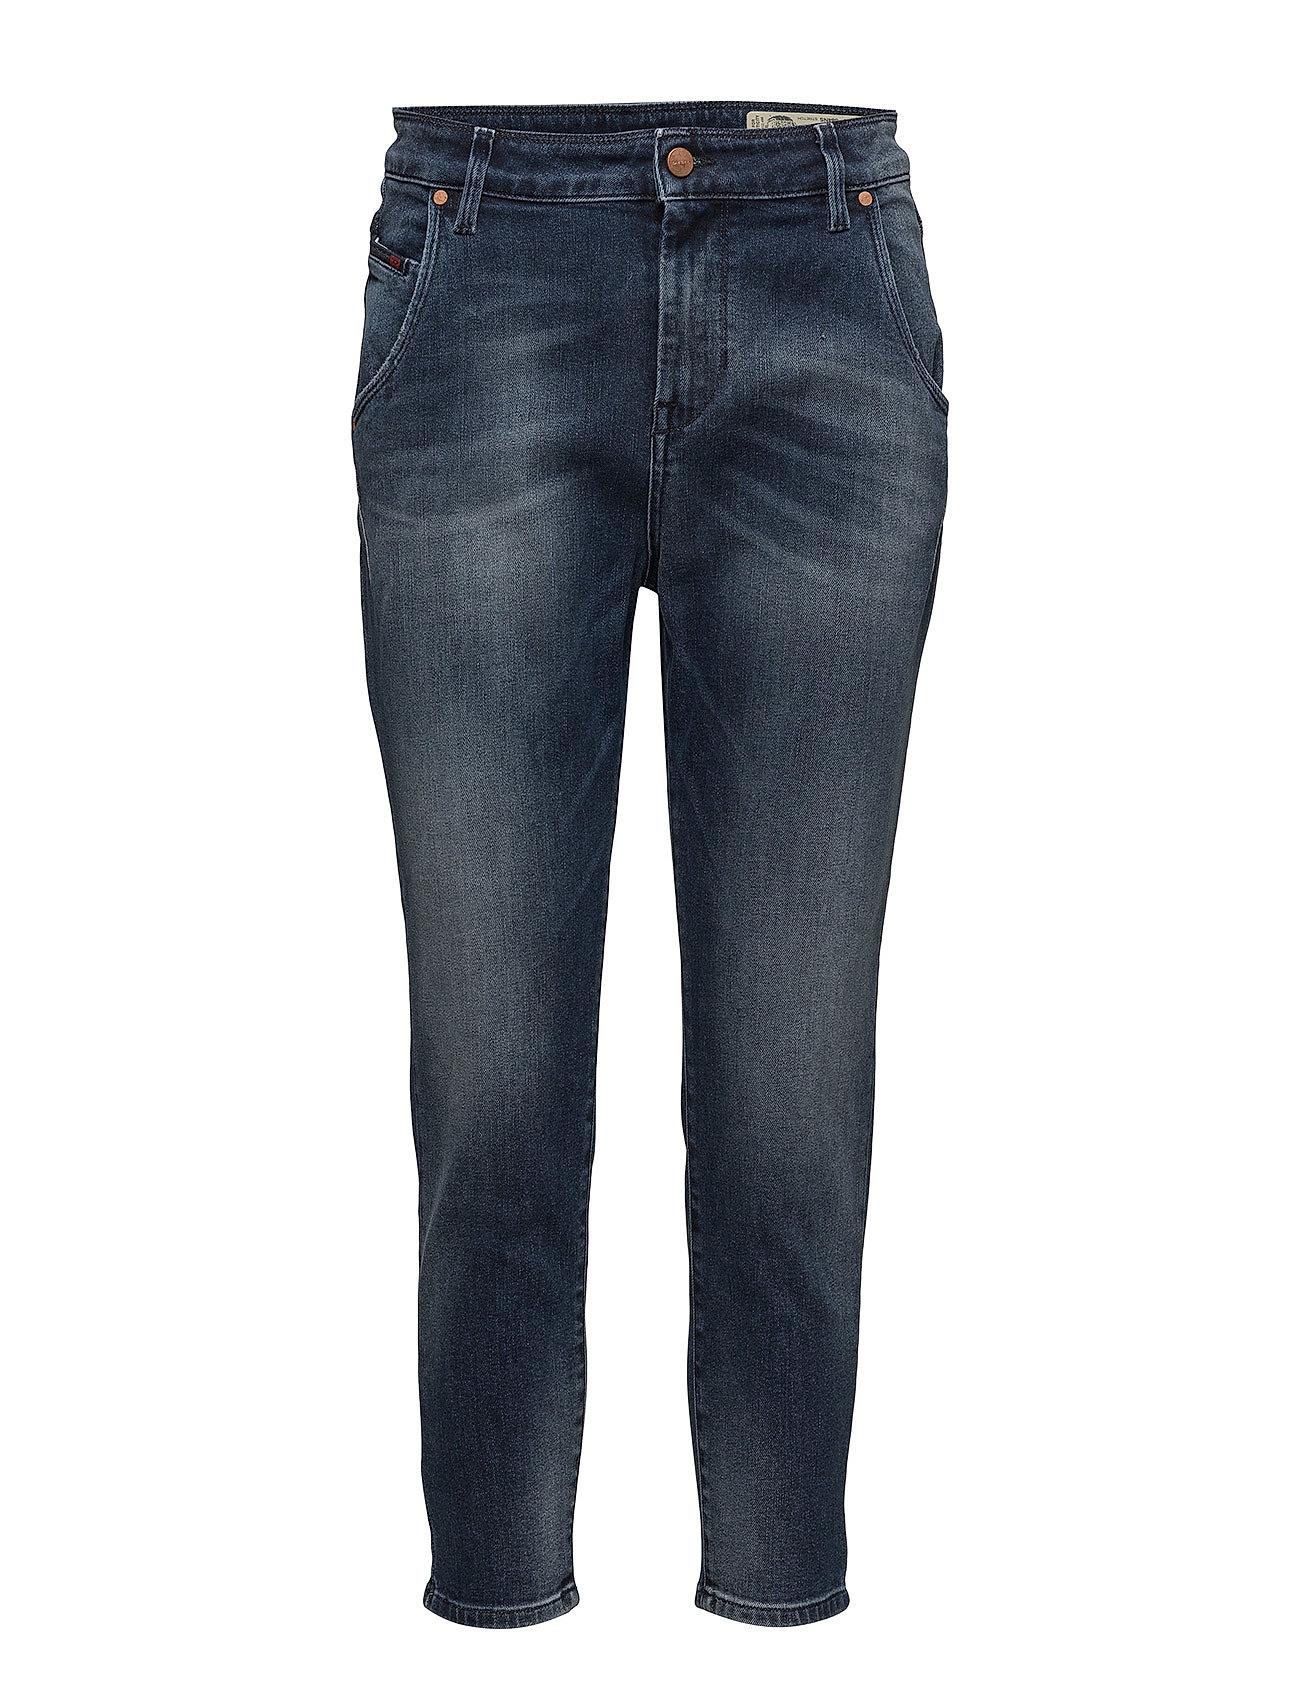 Fayza-Evo L.30 Trousers